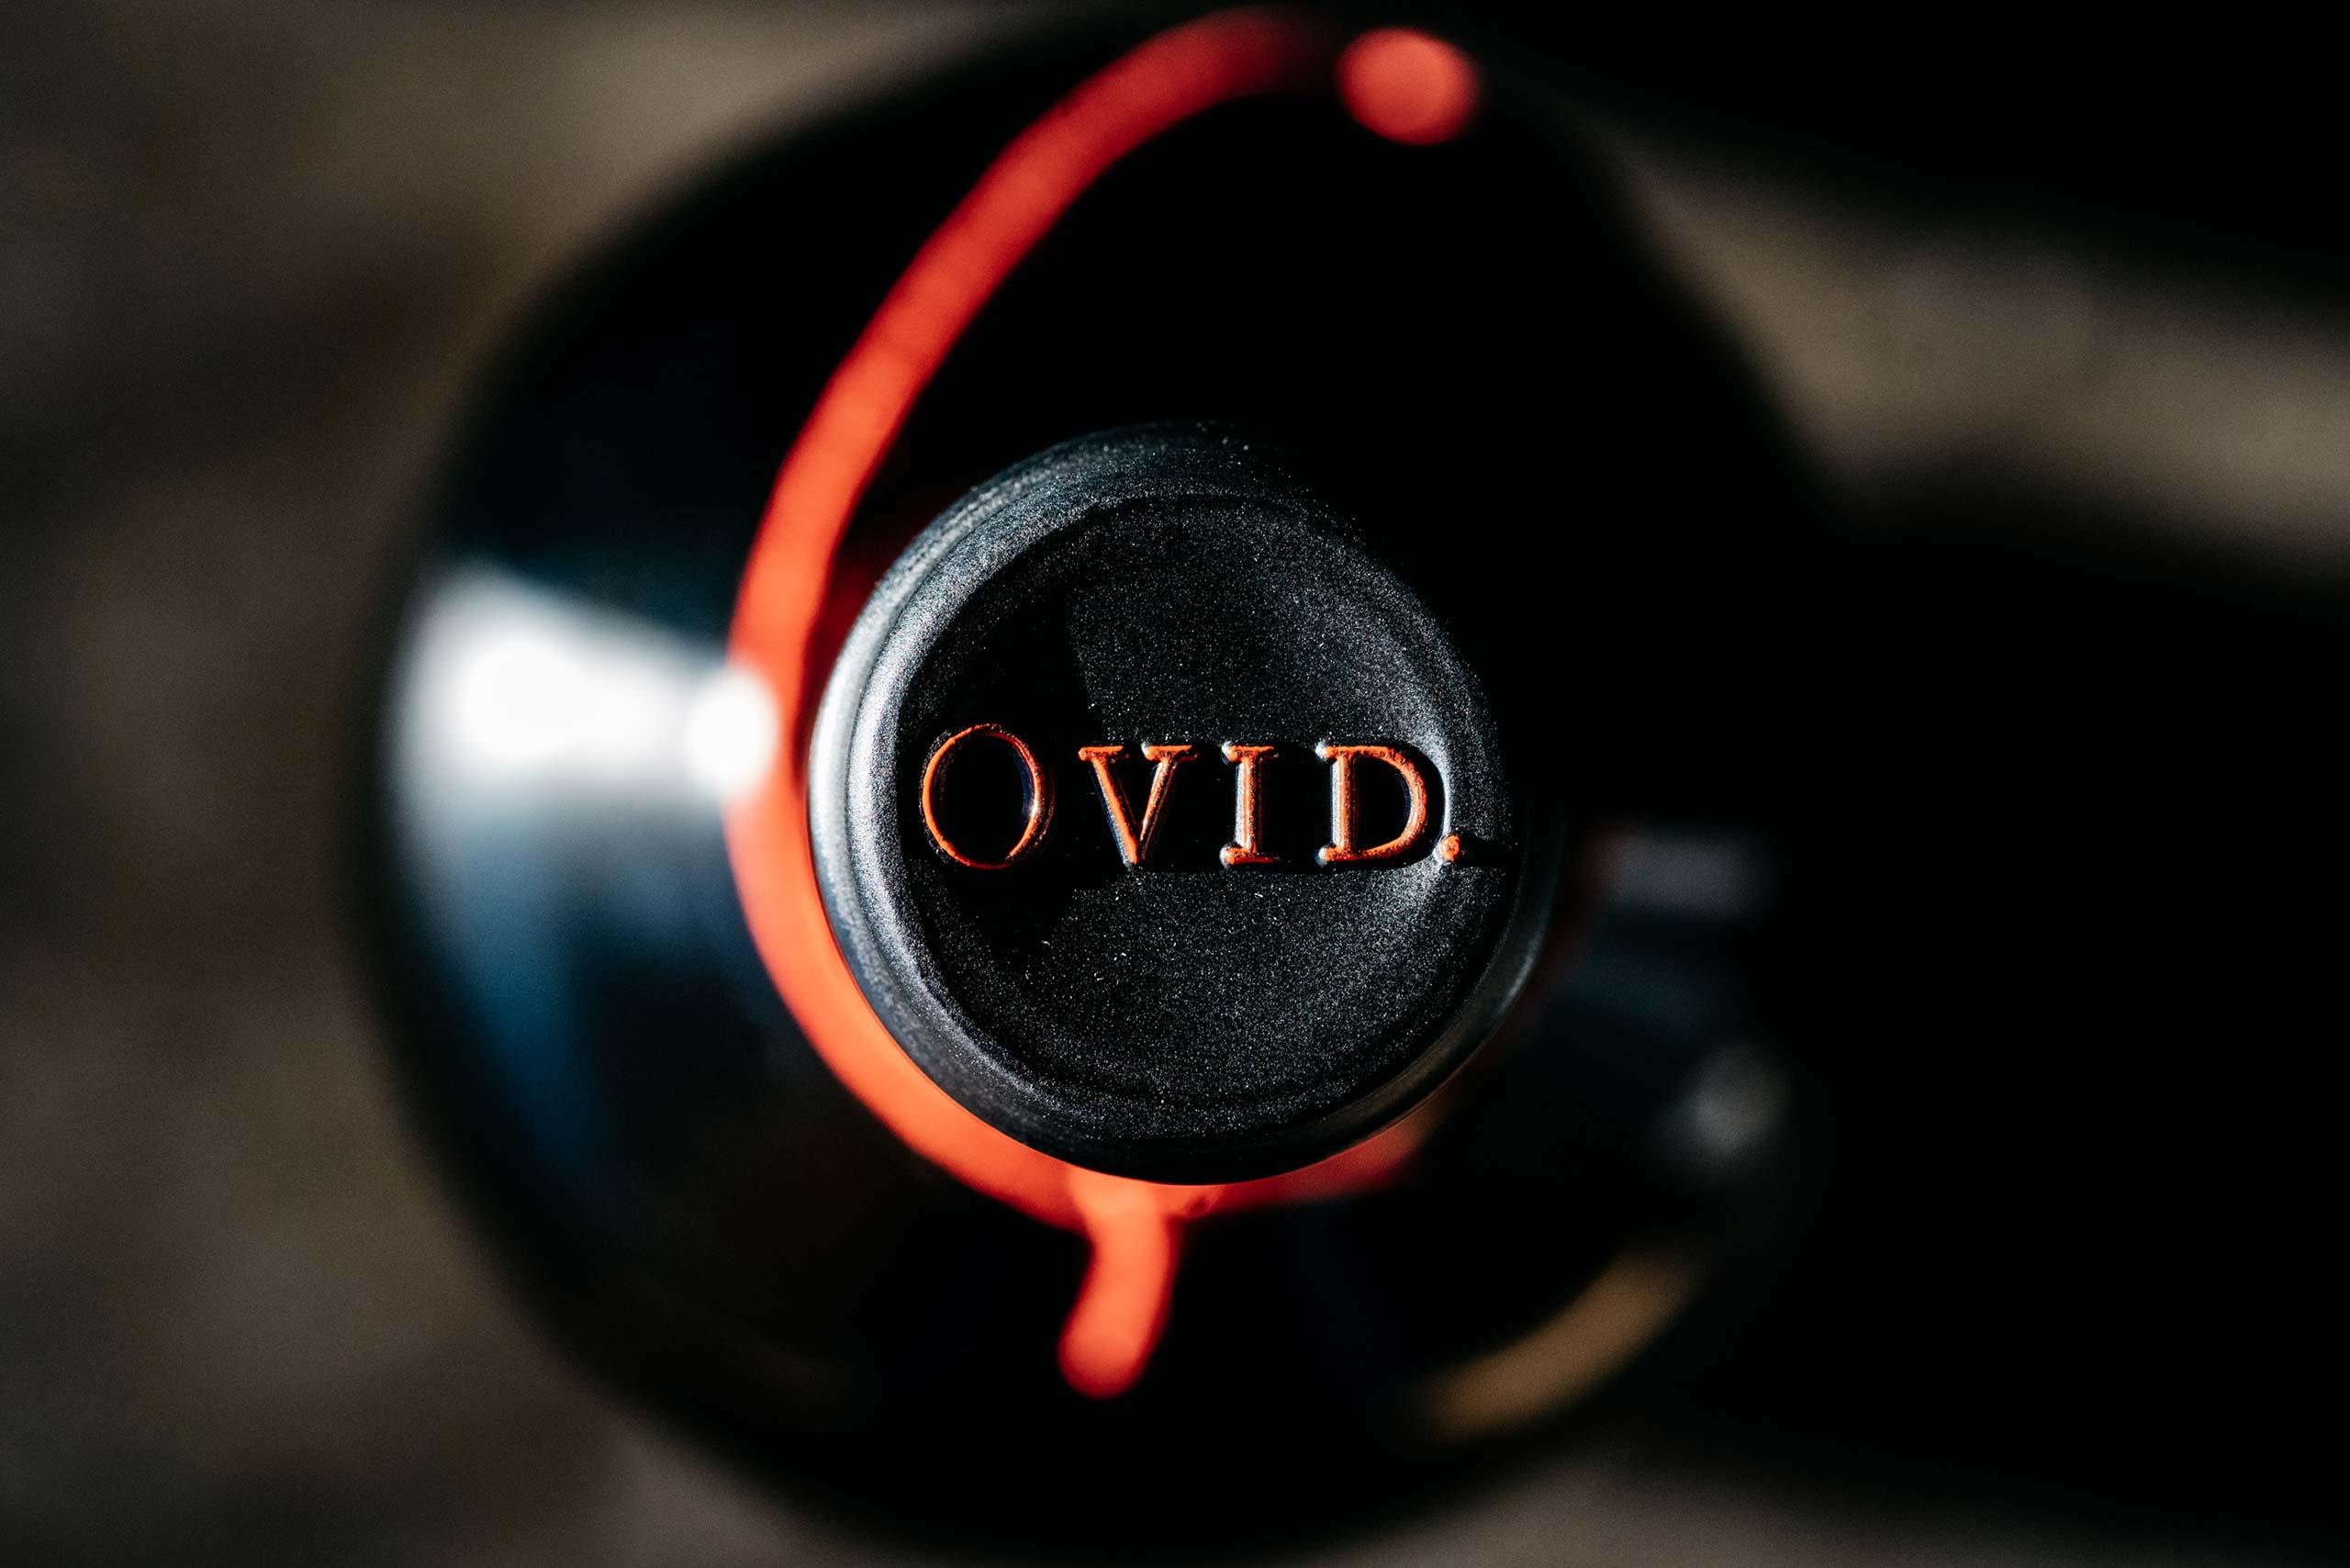 OVID wine capsule closeup